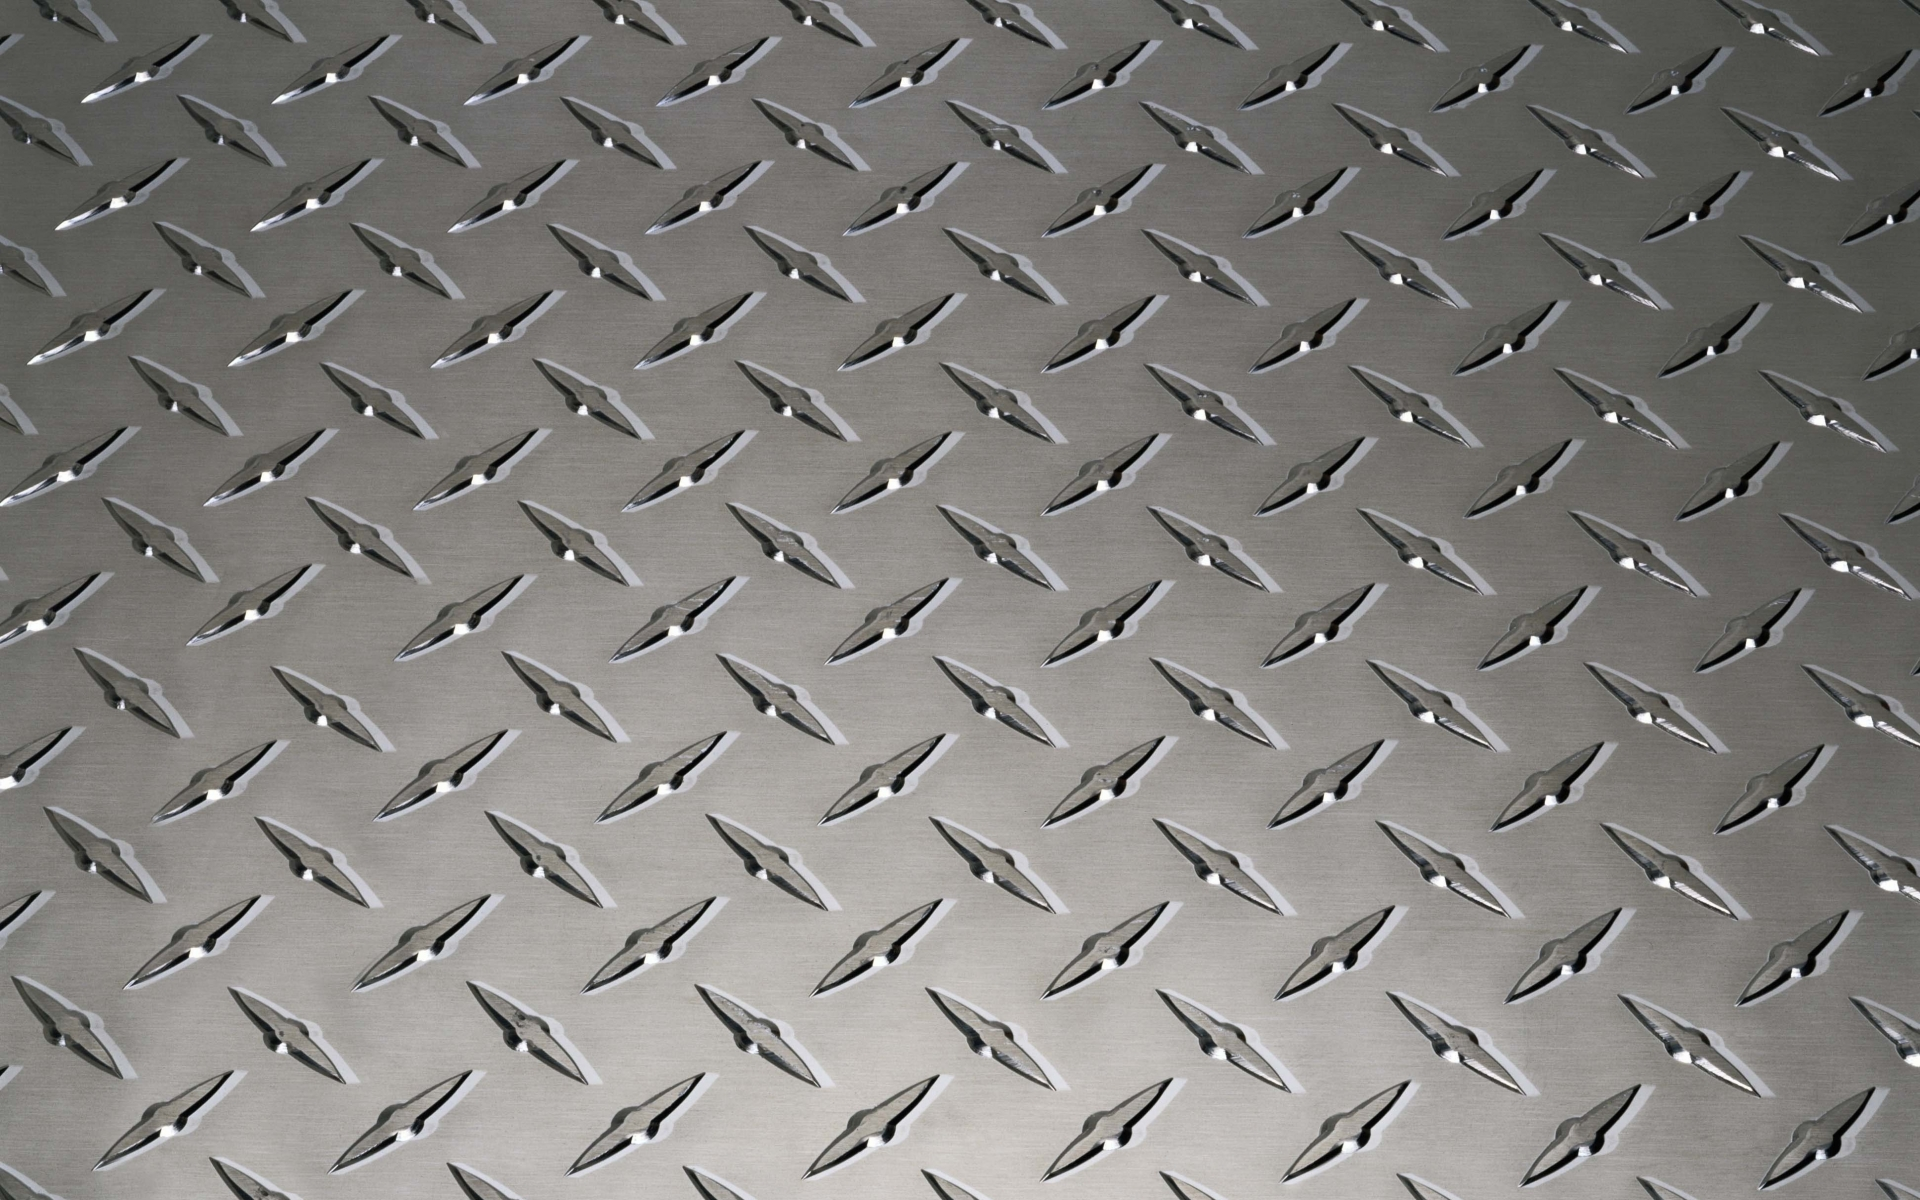 multicolor metal diamond plate 3885x2565 wallpaper Art HD Wallpaper 1920x1200